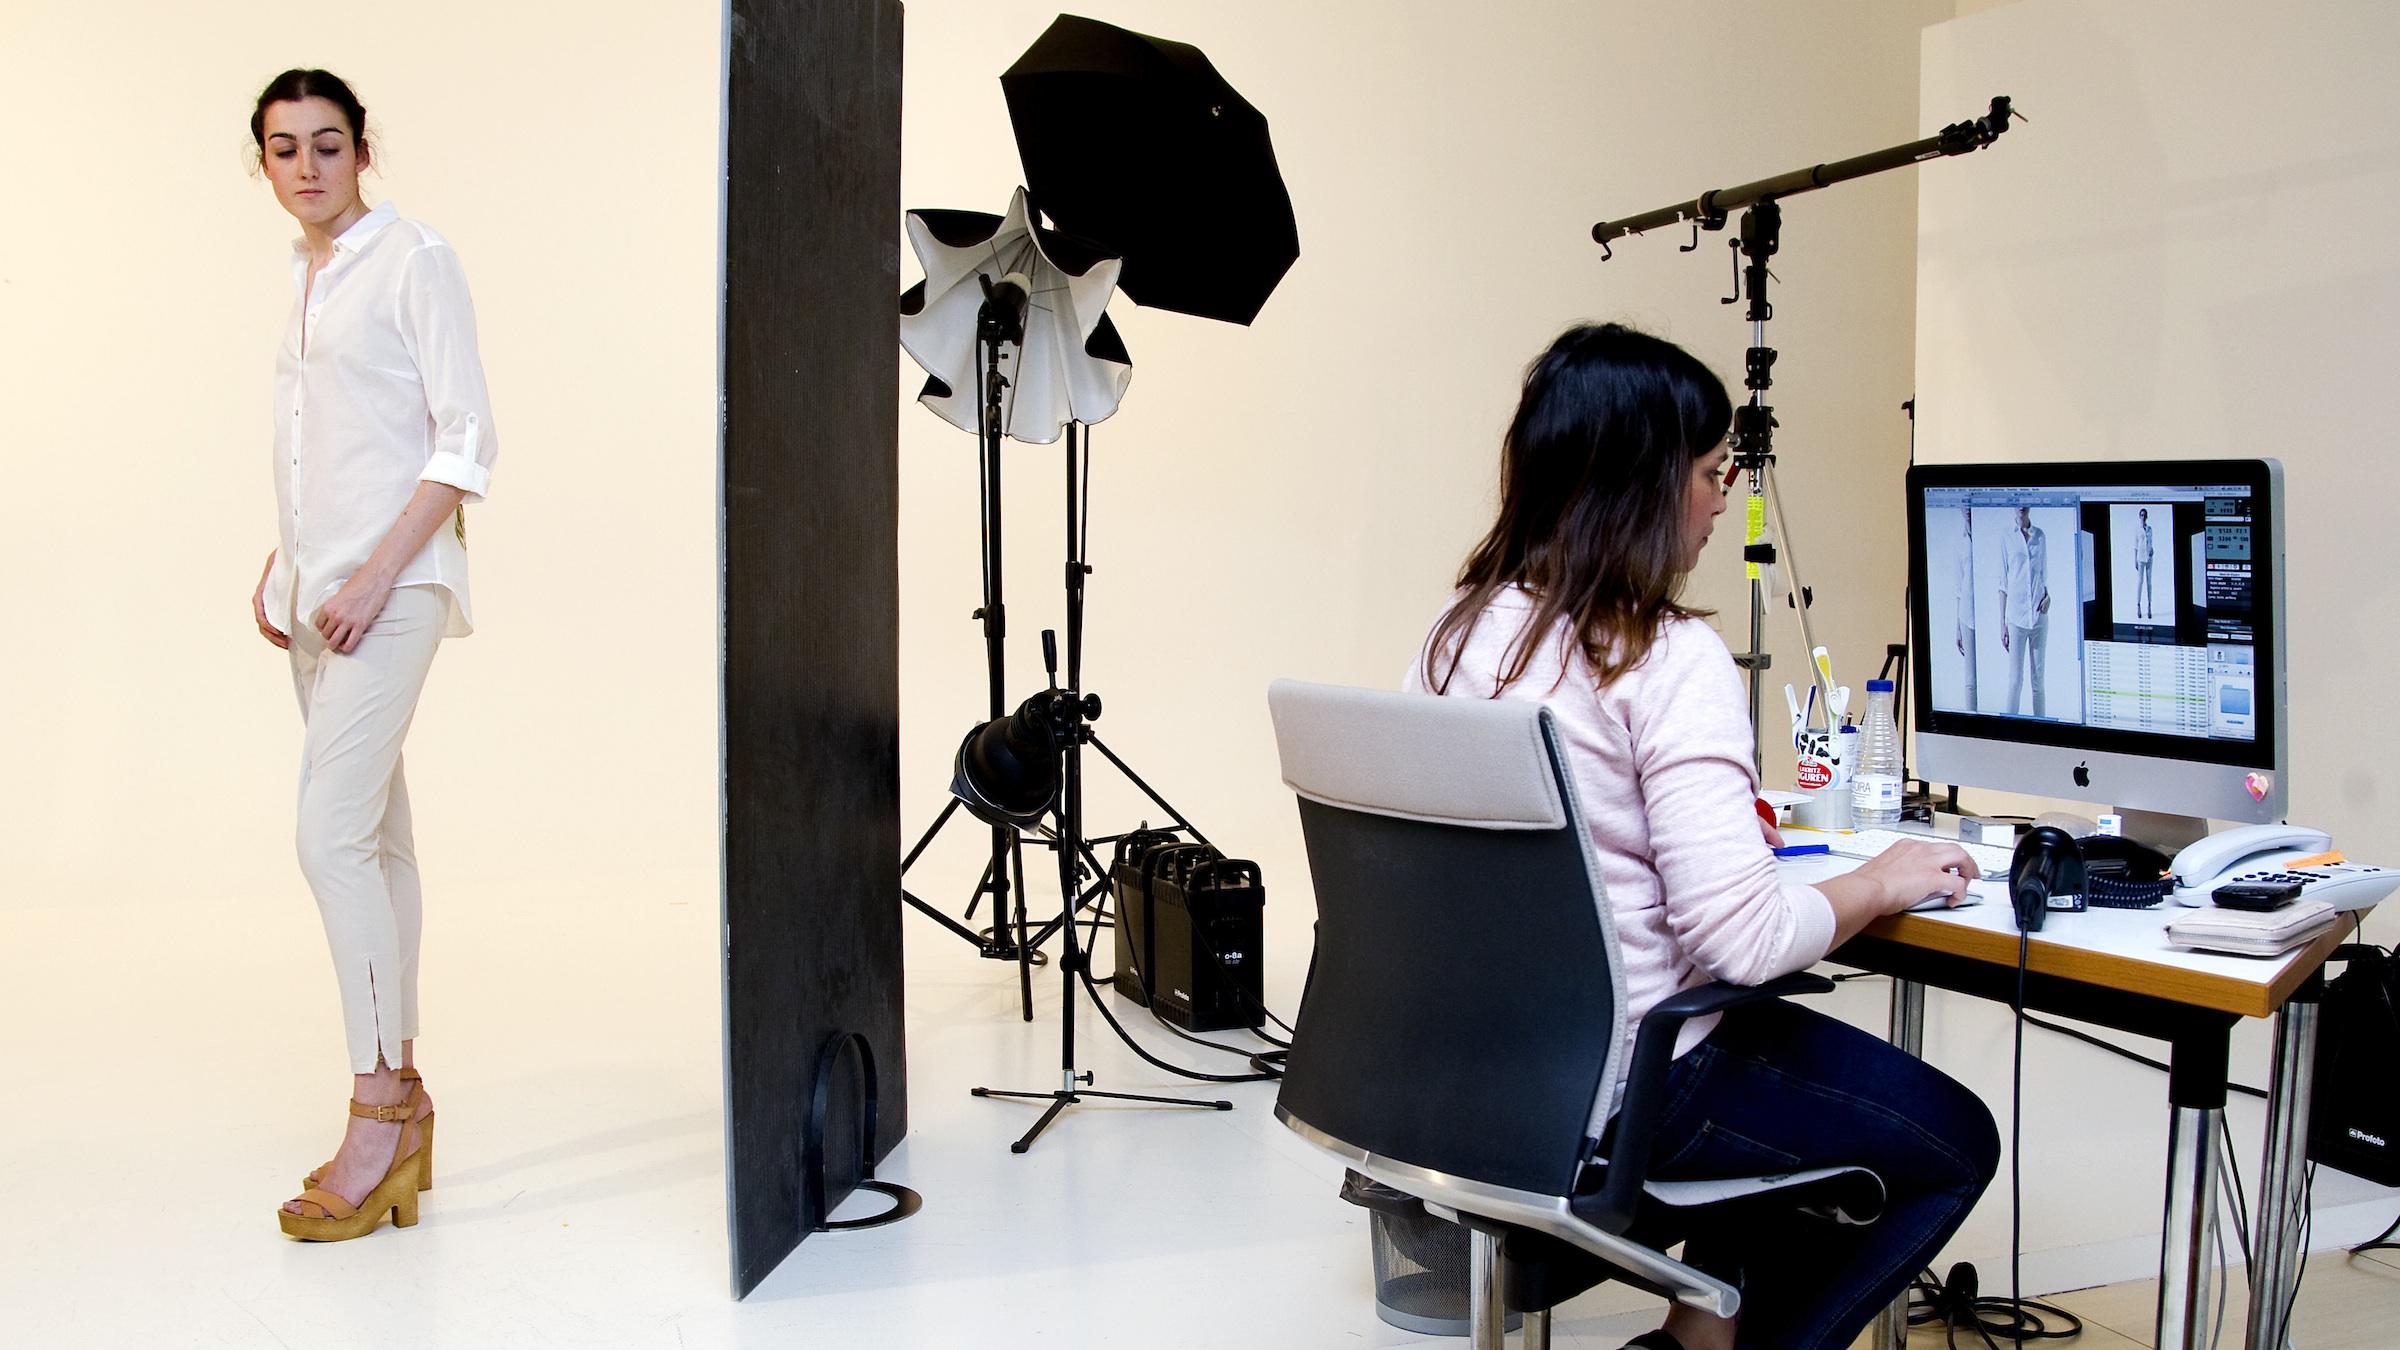 Zara Parent Inditex Risks Falling Out Of Fashion Quartz